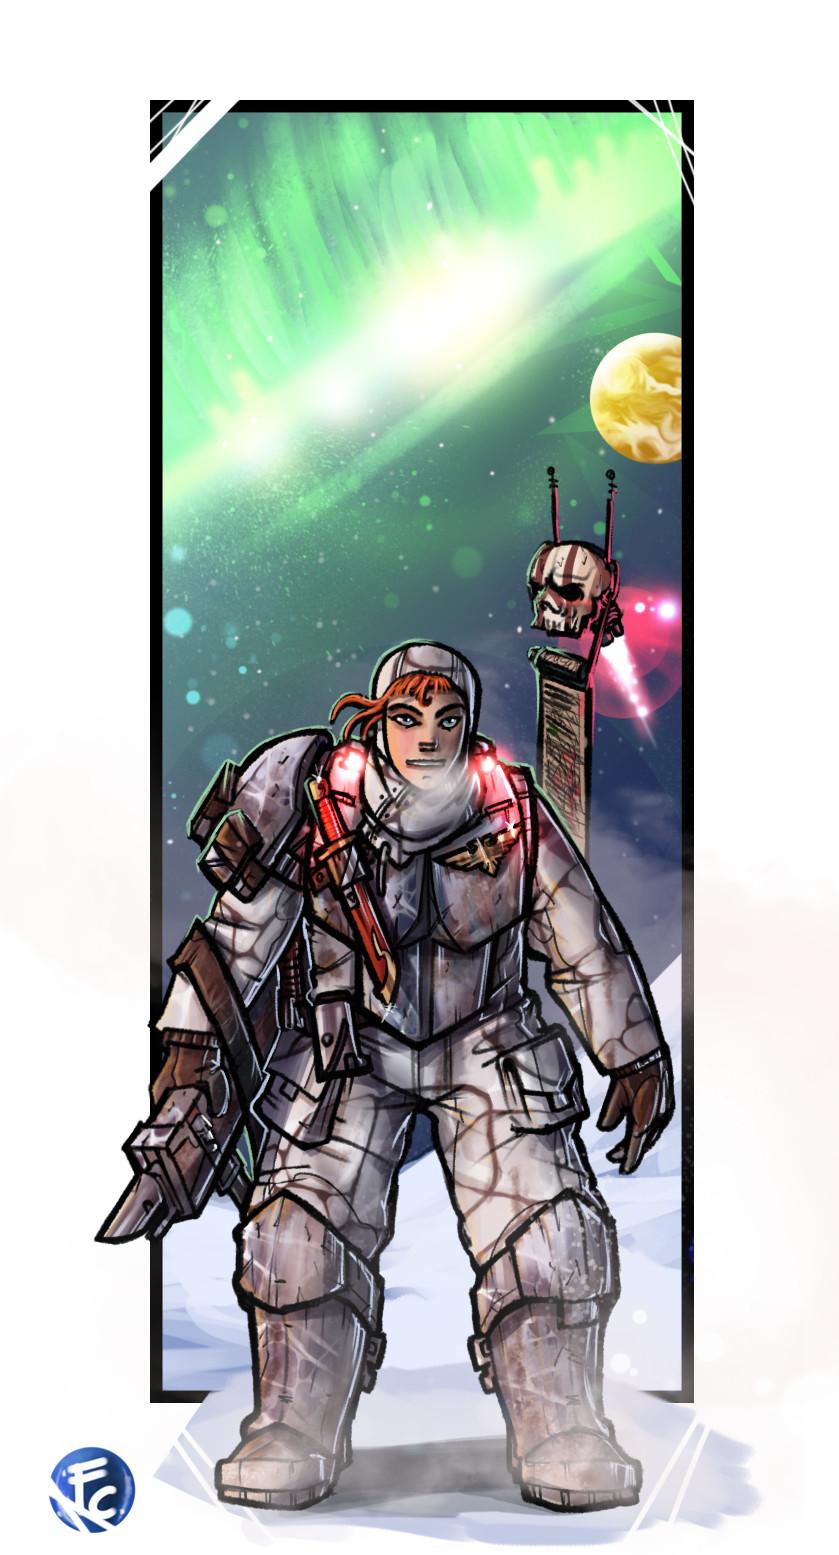 Imperial Guard Guardswoman